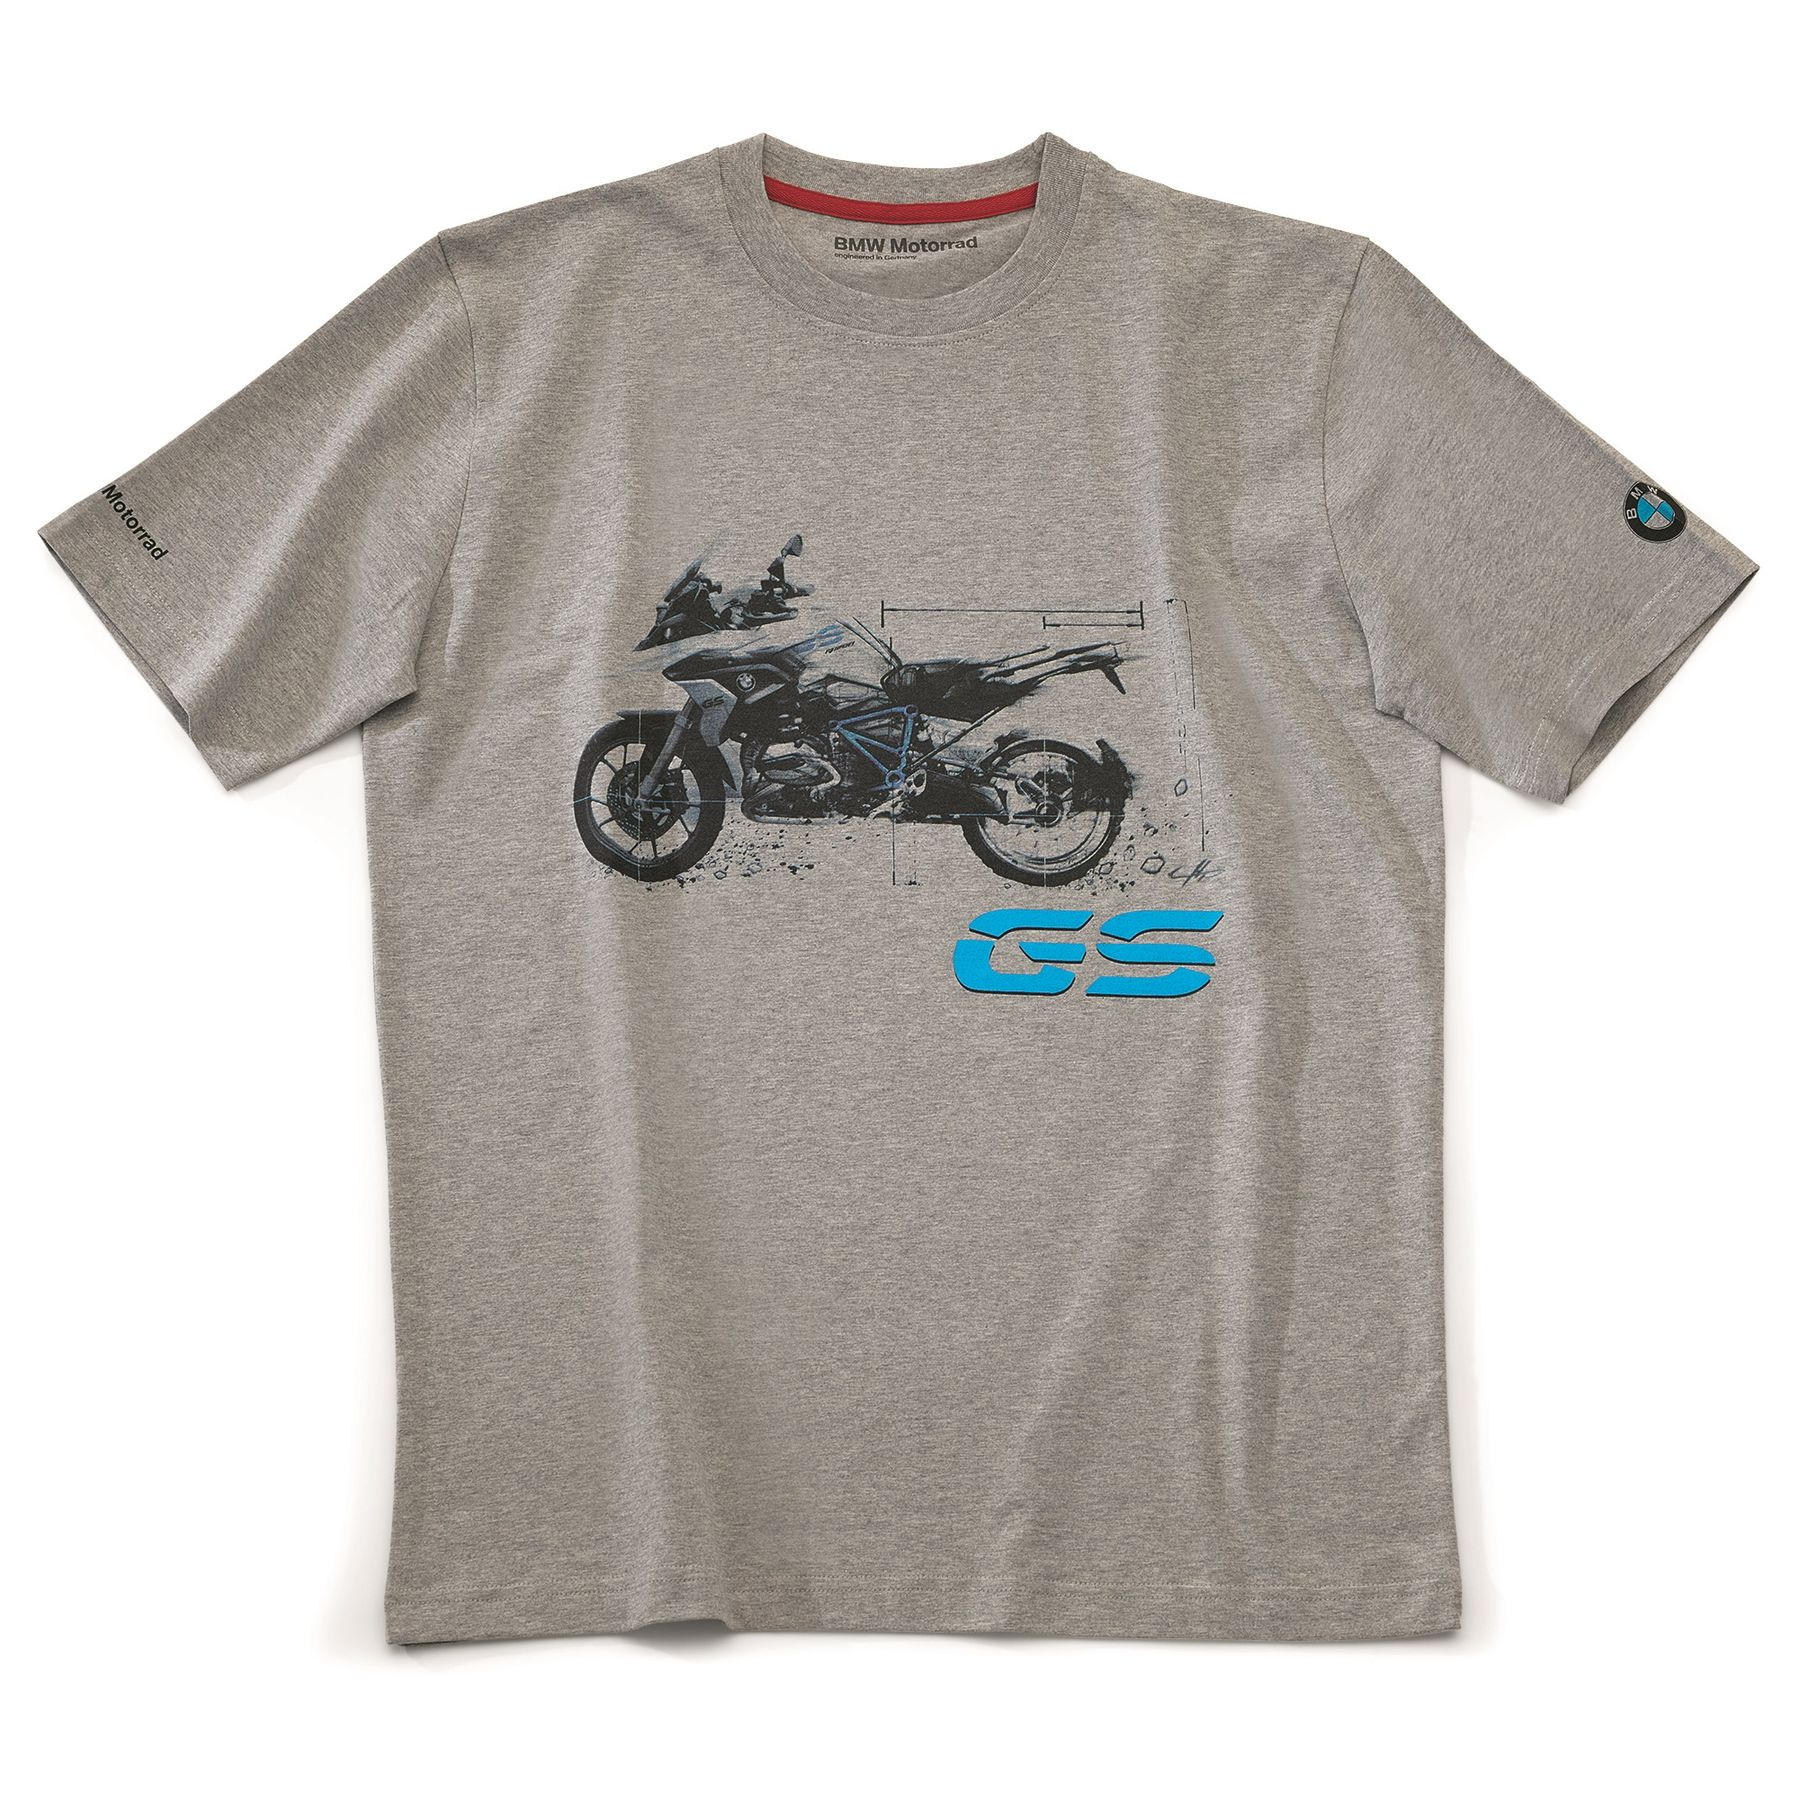 New BMW Motorrad F850 GS Adventure Performance Racing T shirt S-2XL Bike Sport